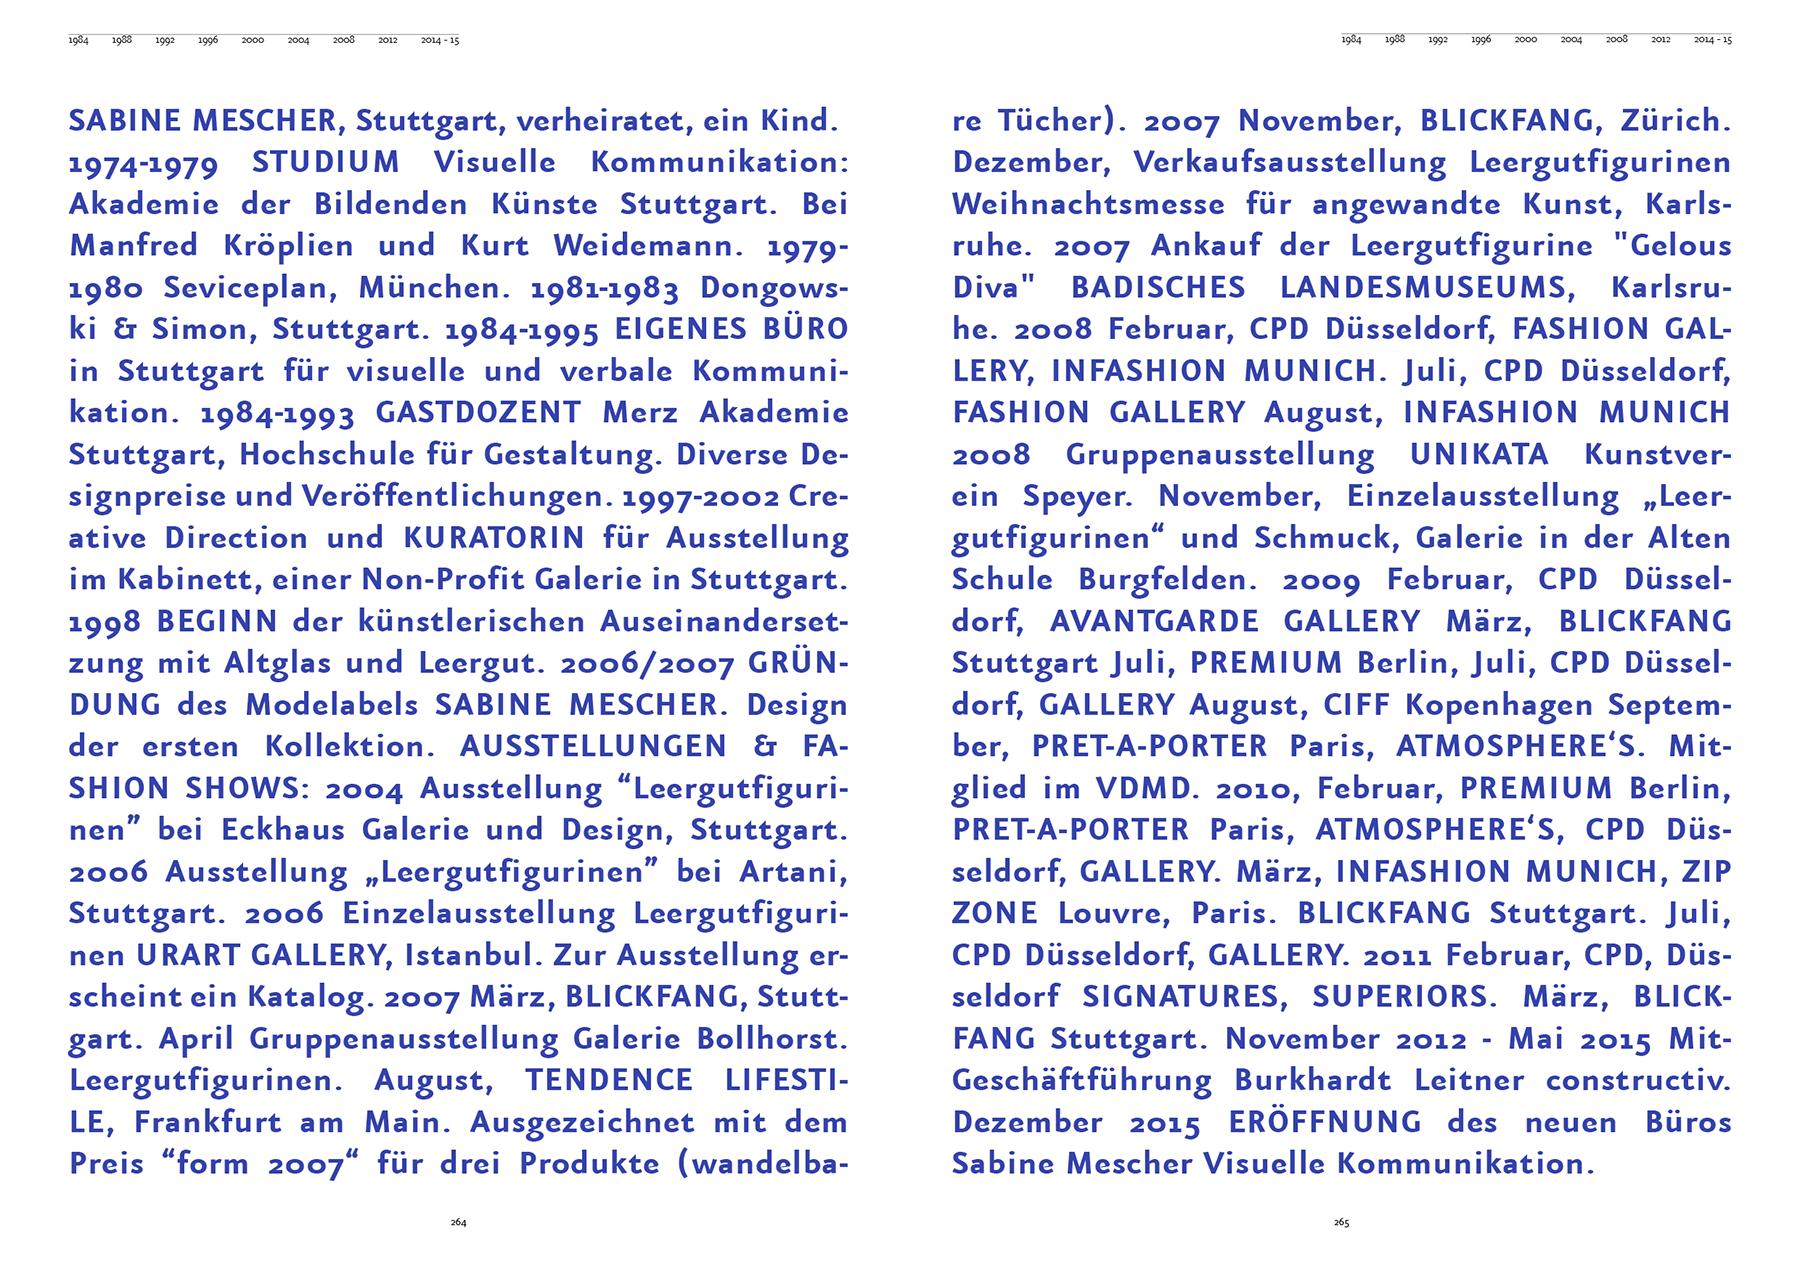 sabine-mescher-sichtung-designbilderbuch-bio.png